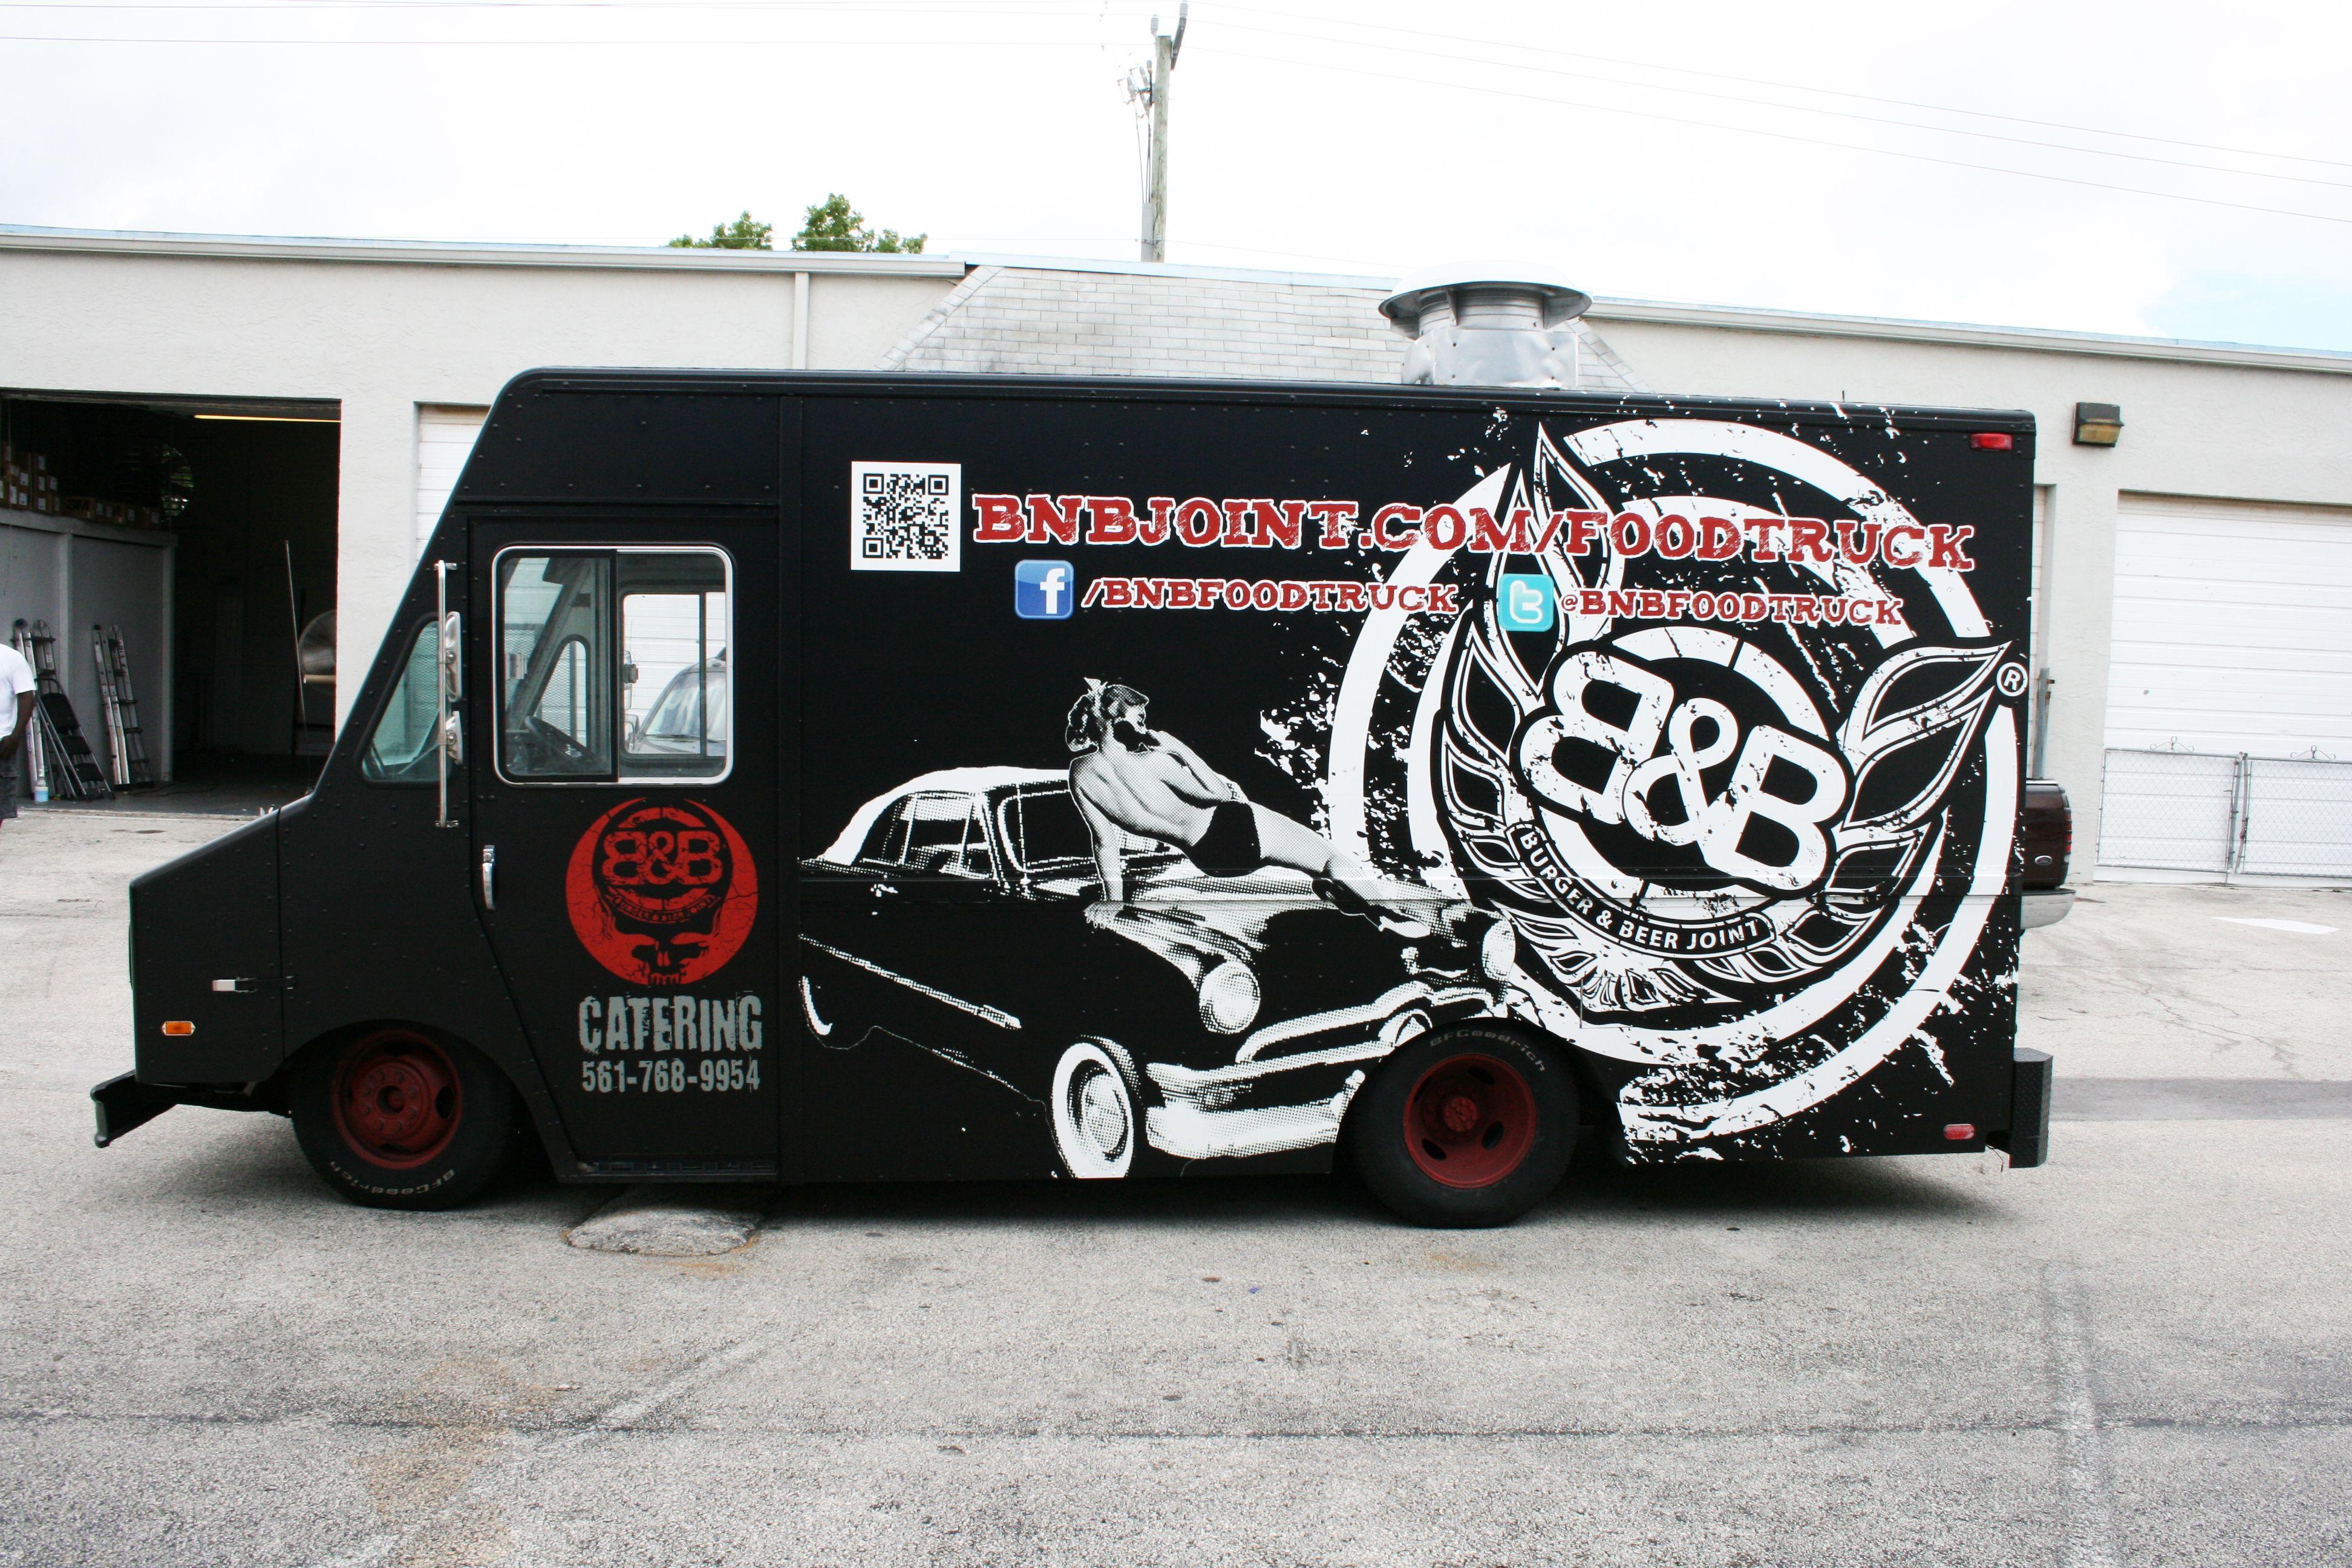 Step van food truck vinyl vehcle wraps fort lauderdale florida http carwrapsolutions